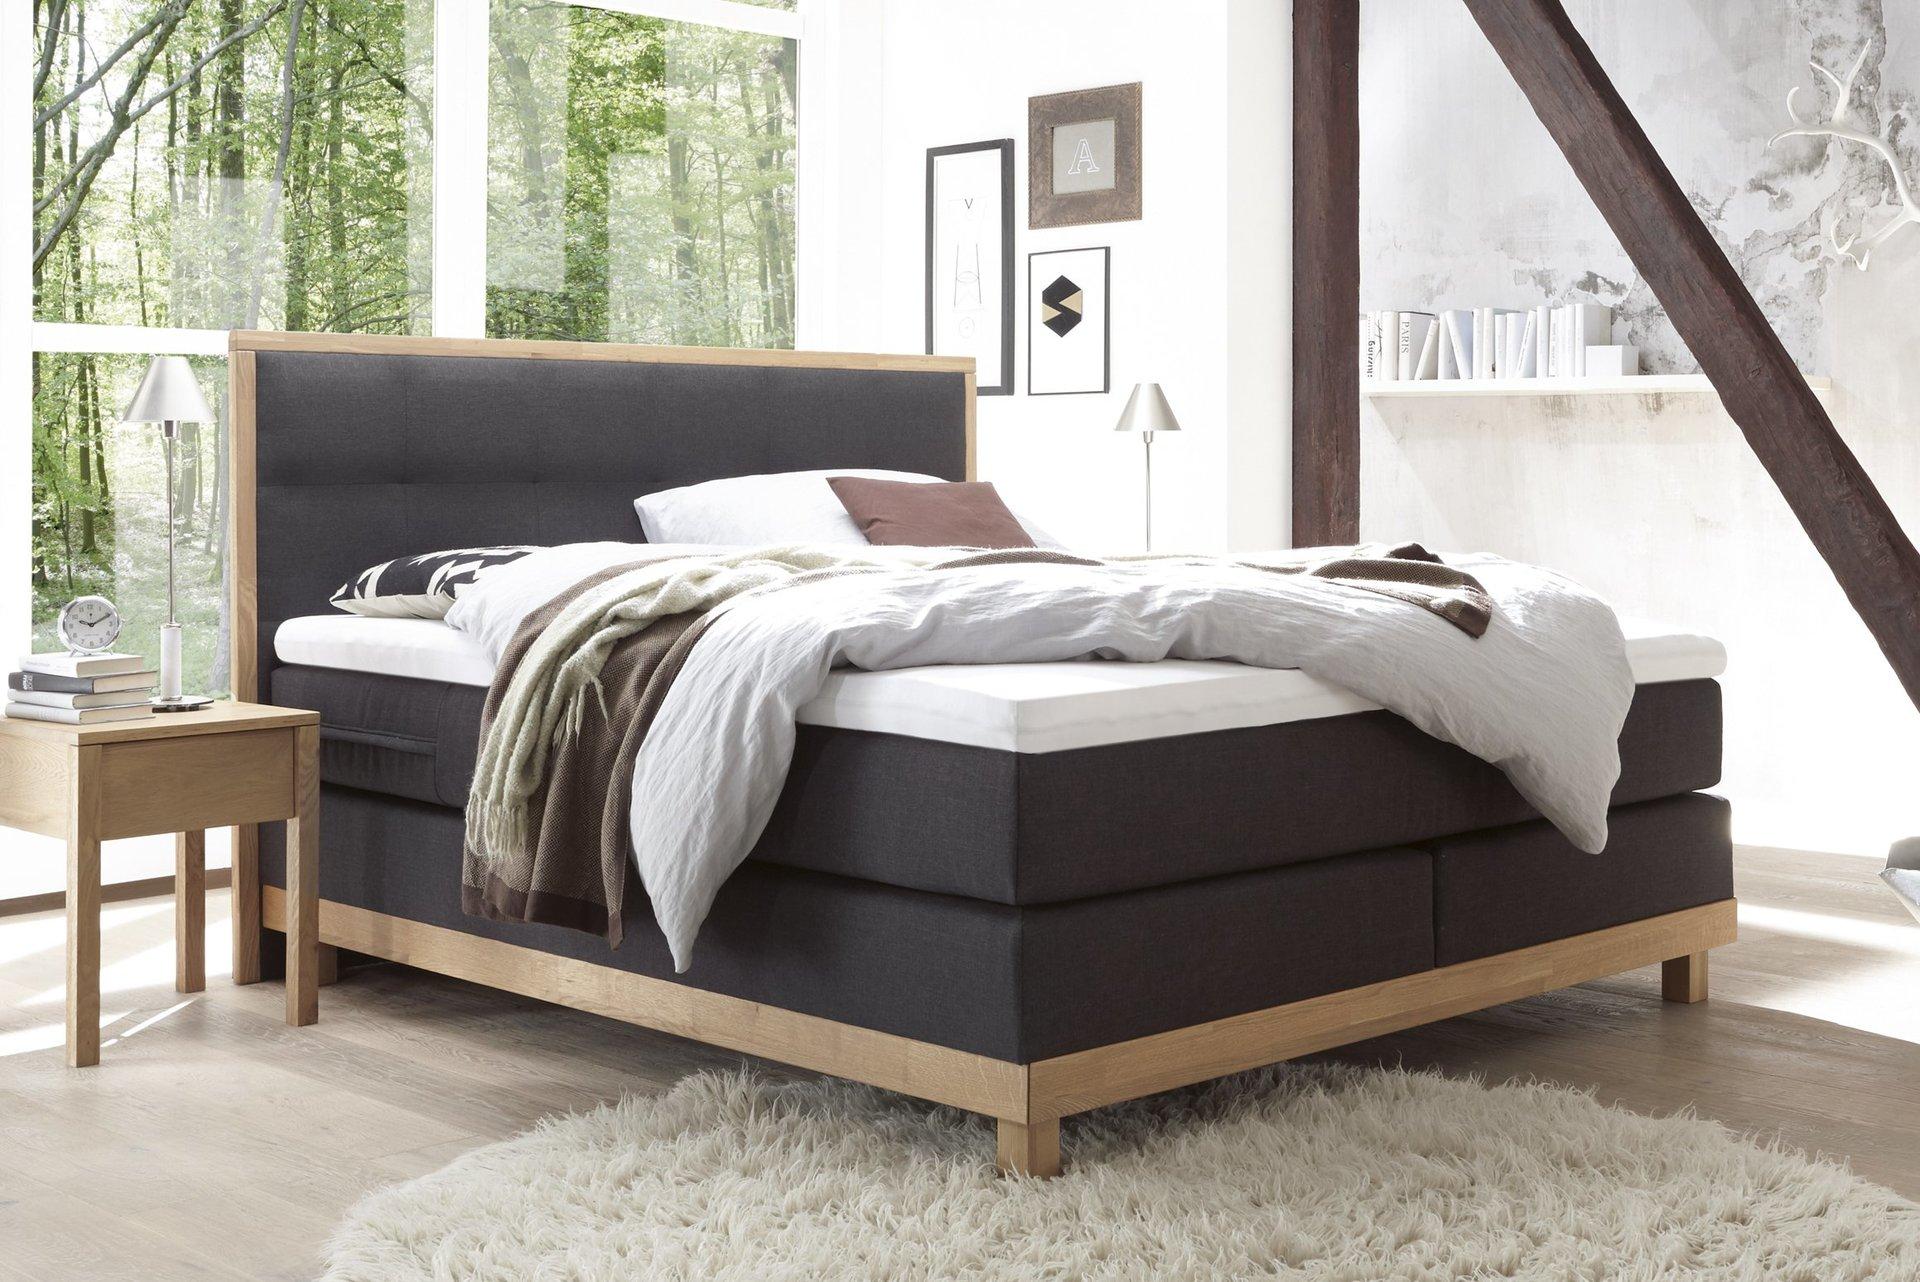 boxspringbett ohne metall, betten-schmidt   die schlafexperten, Design ideen